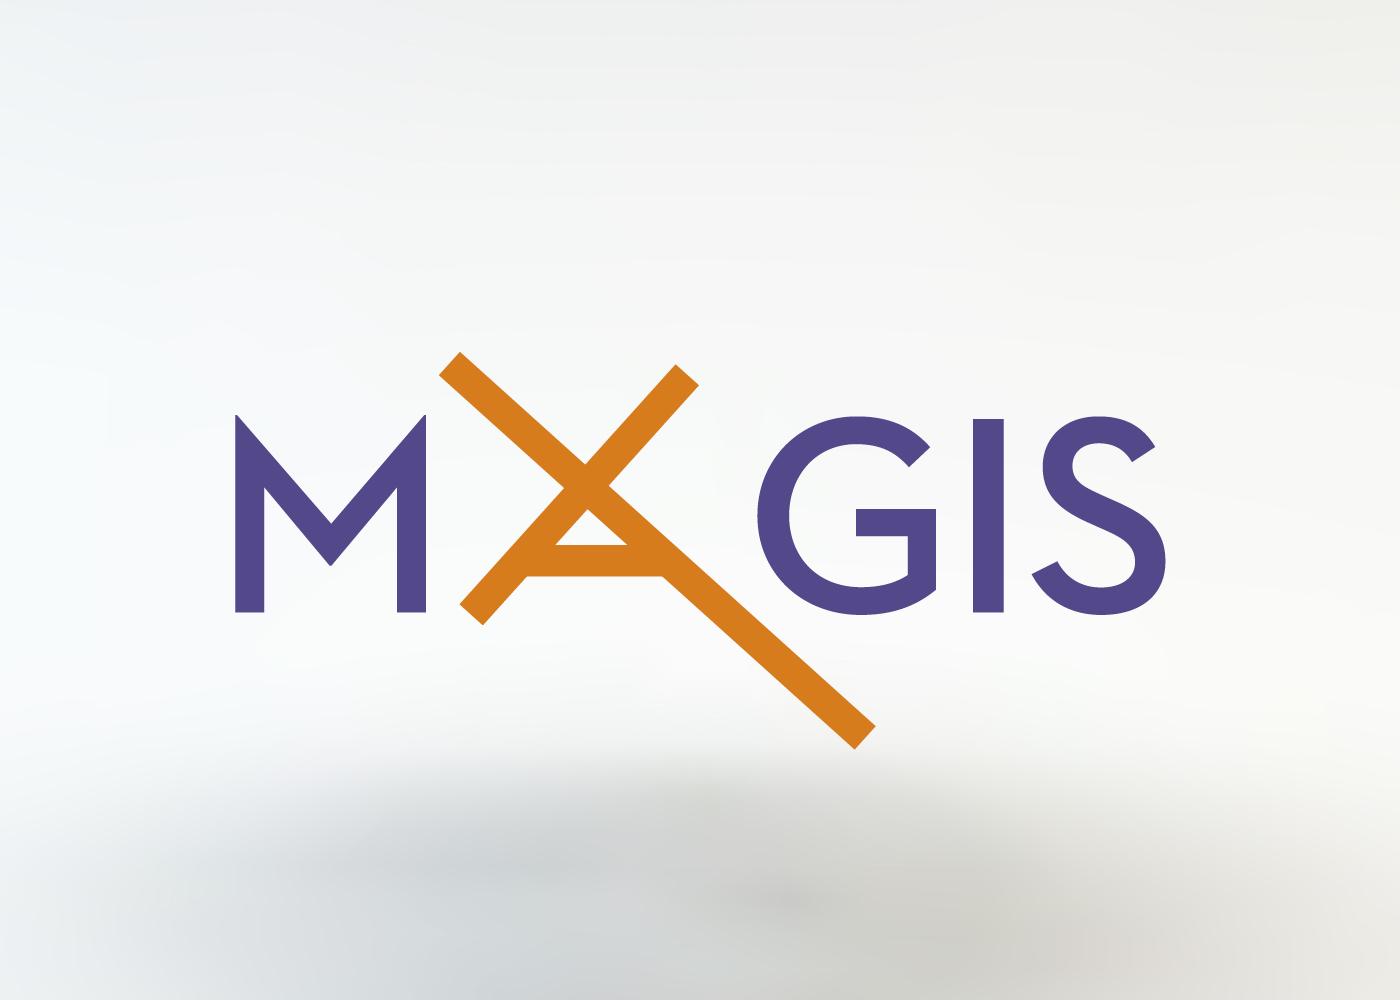 The Visual Identity Design for Magis Organization